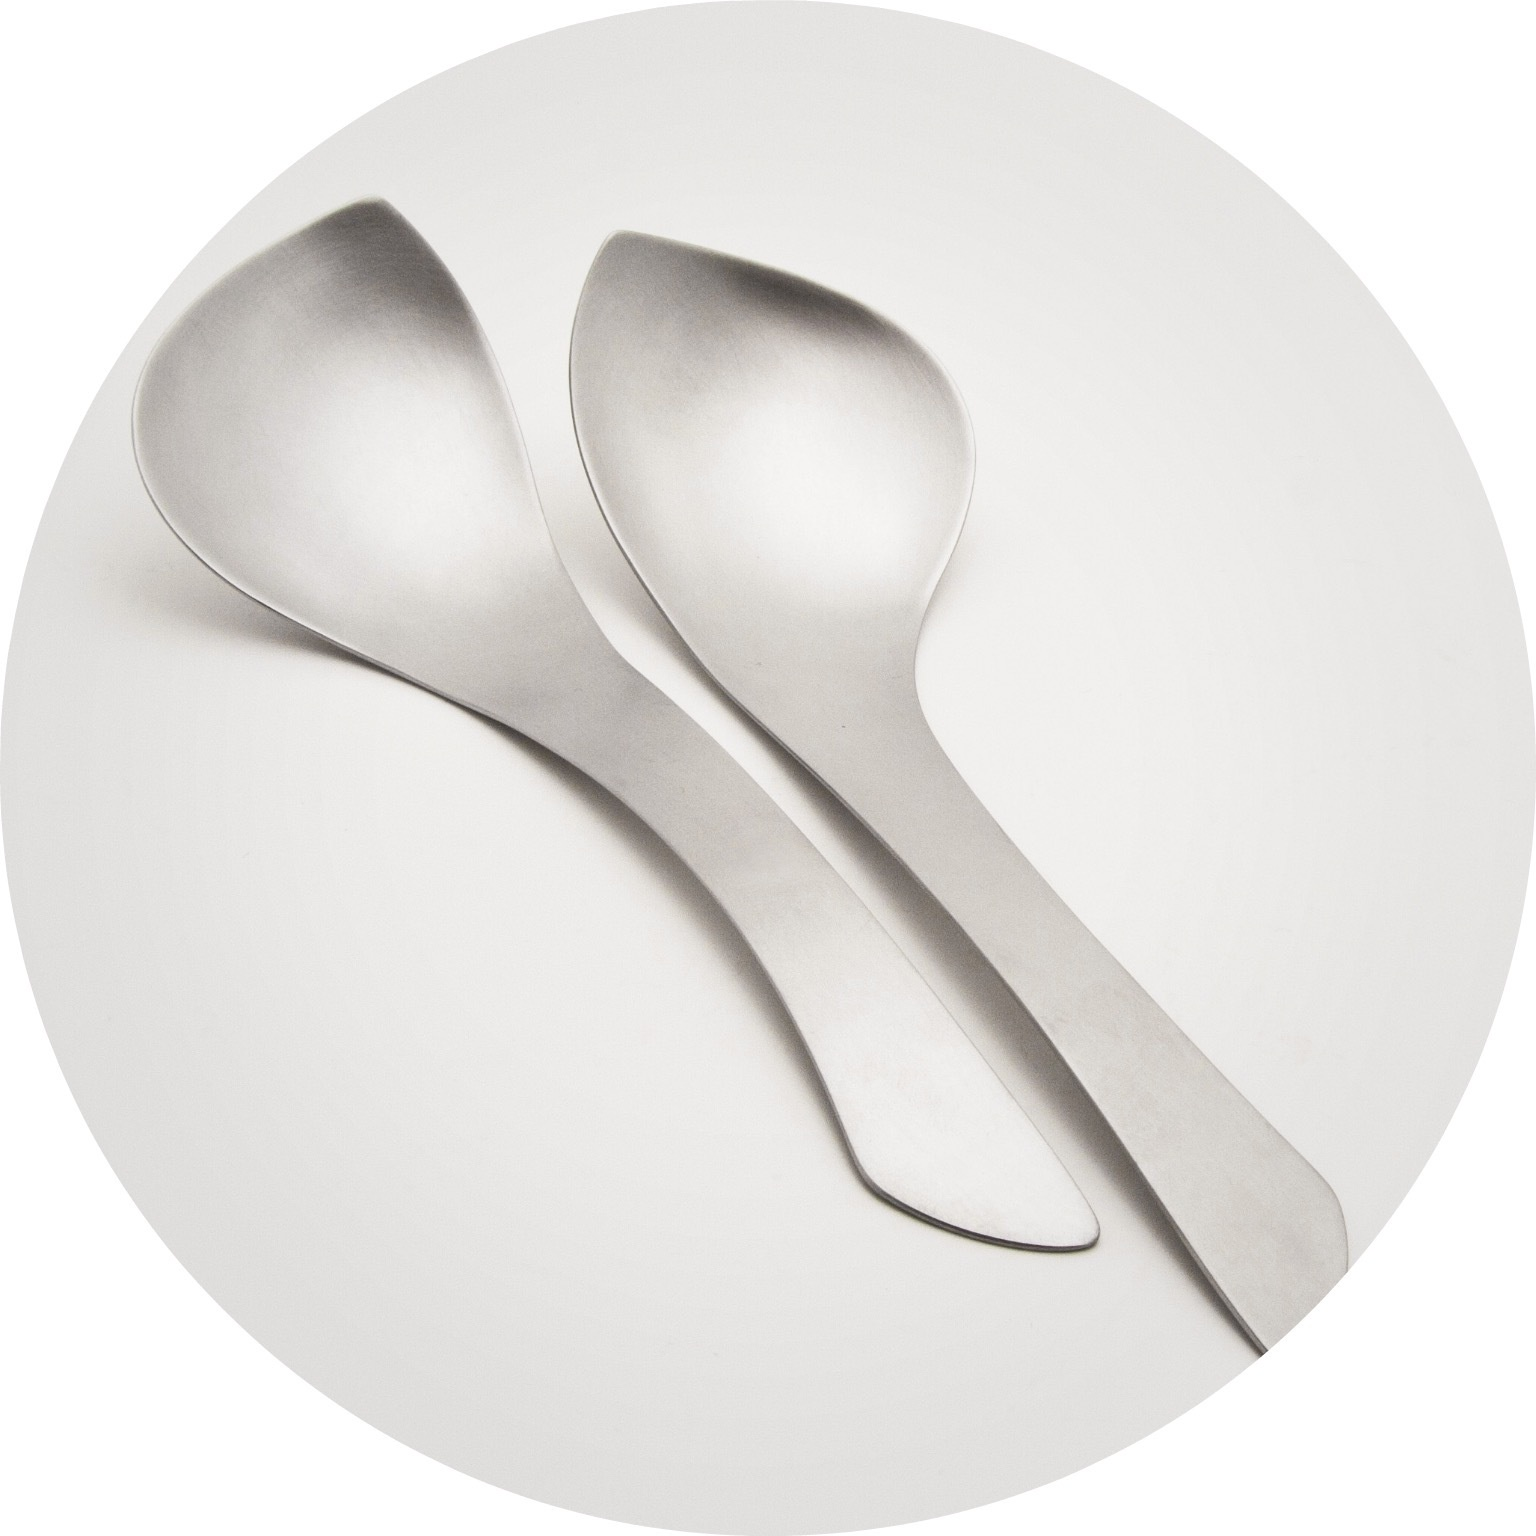 Alison Jackson– Big Spoons. Stainless steel (set of 2)